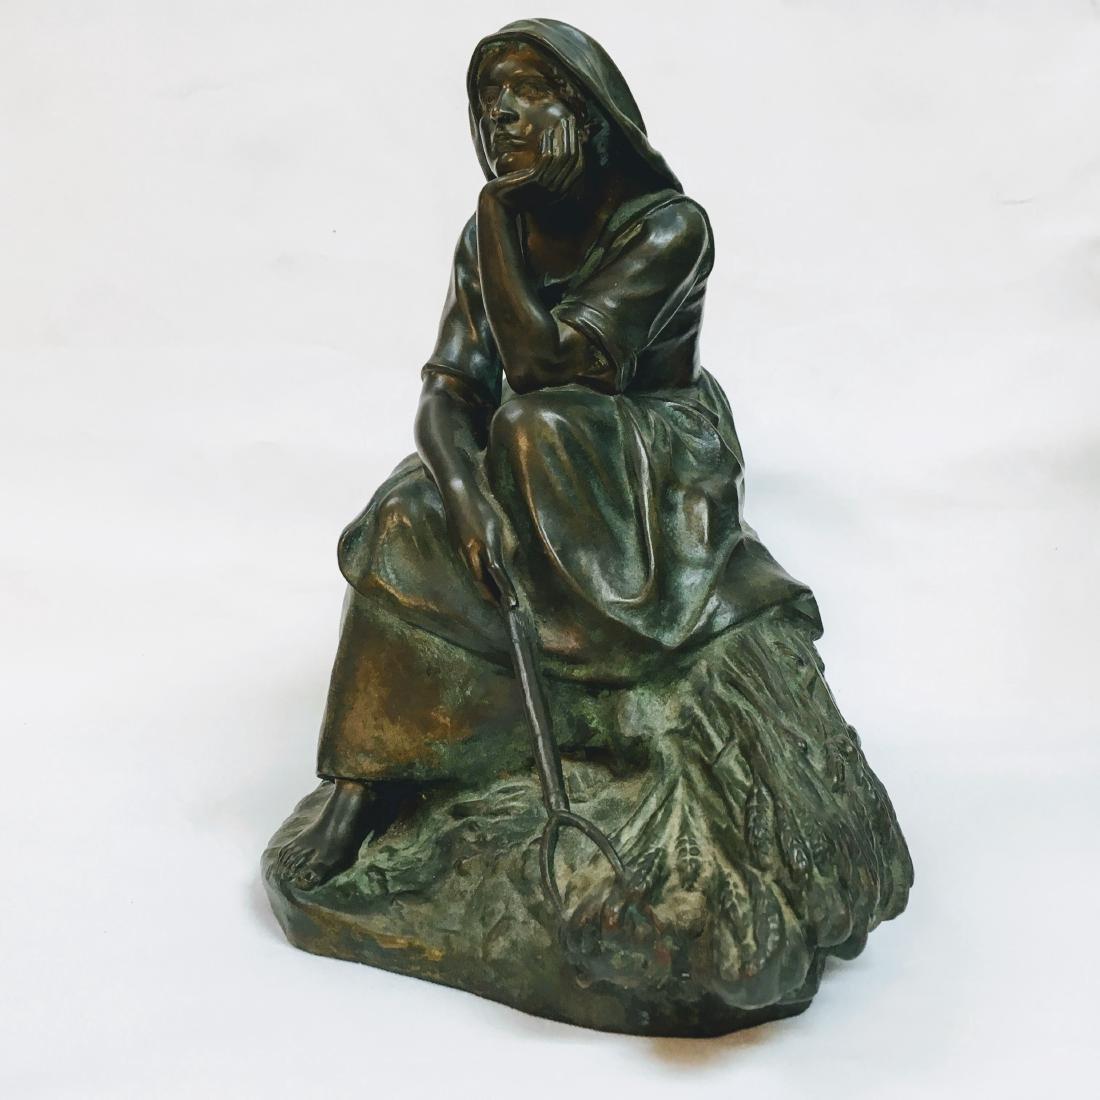 CORNEILLE HENRI THEUNISSEN 1863-1918 REVERIE AU CHAMP - 2